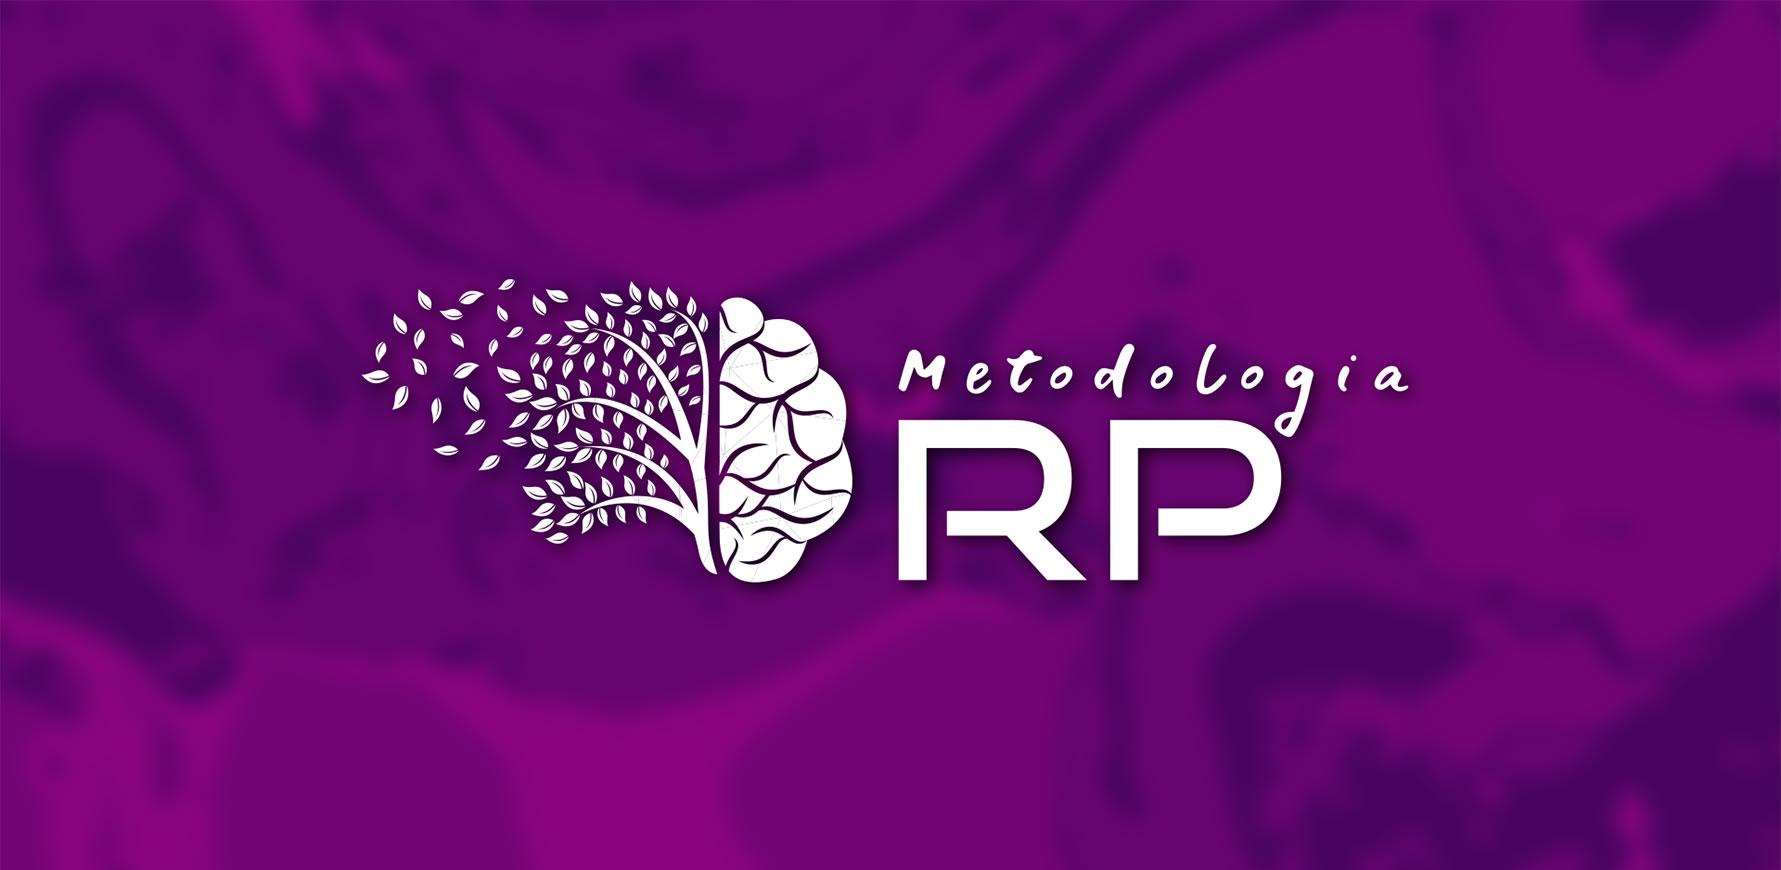 metodologia-rp